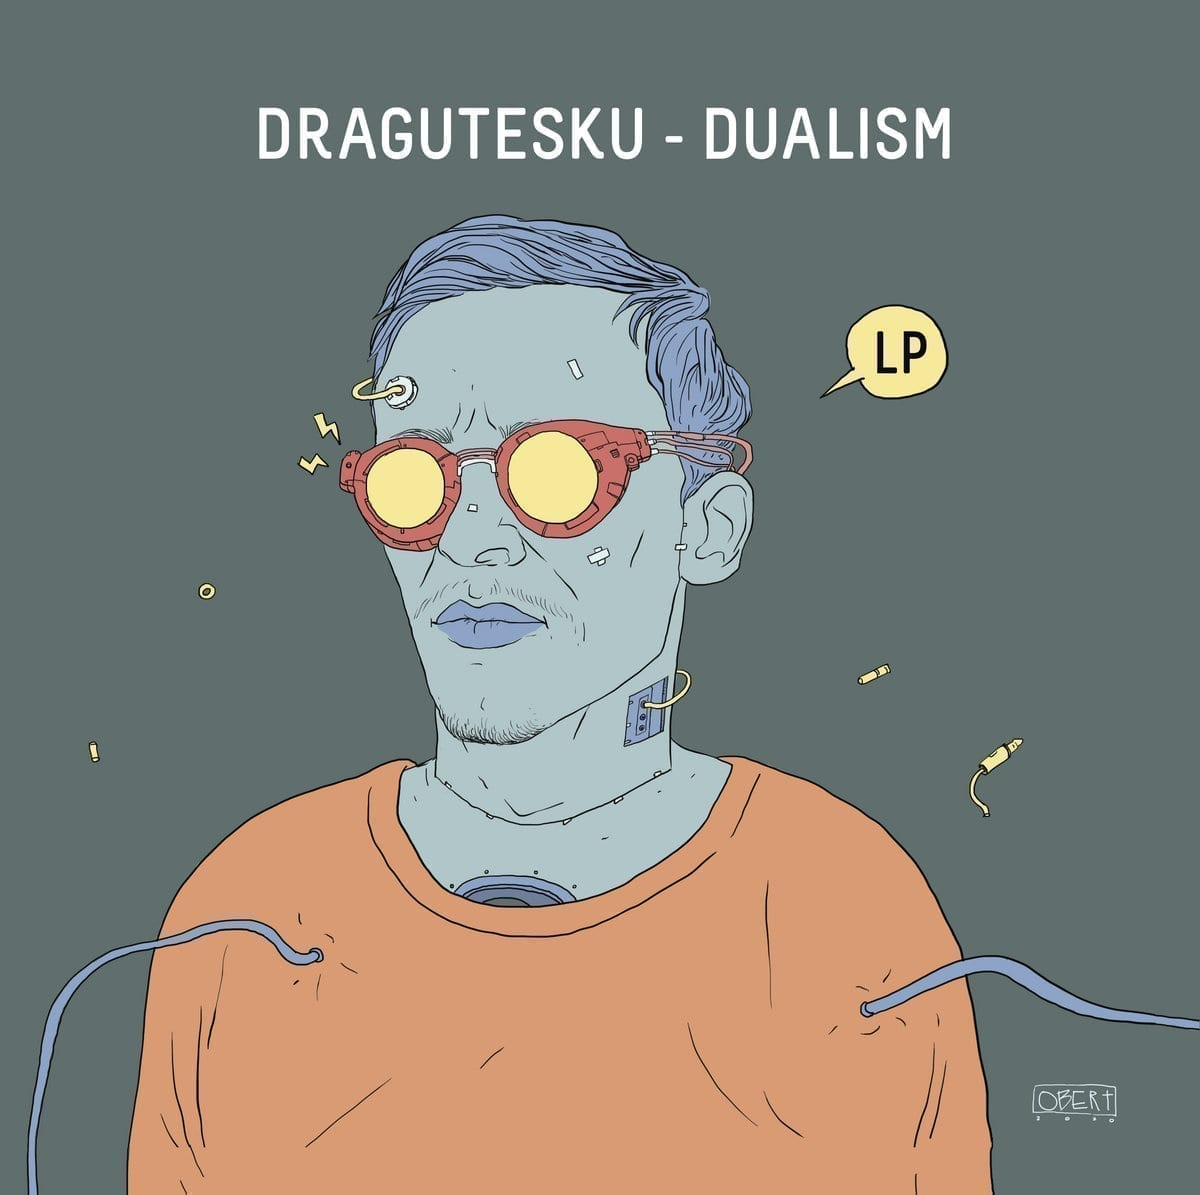 Dragutesku - Dualism LP